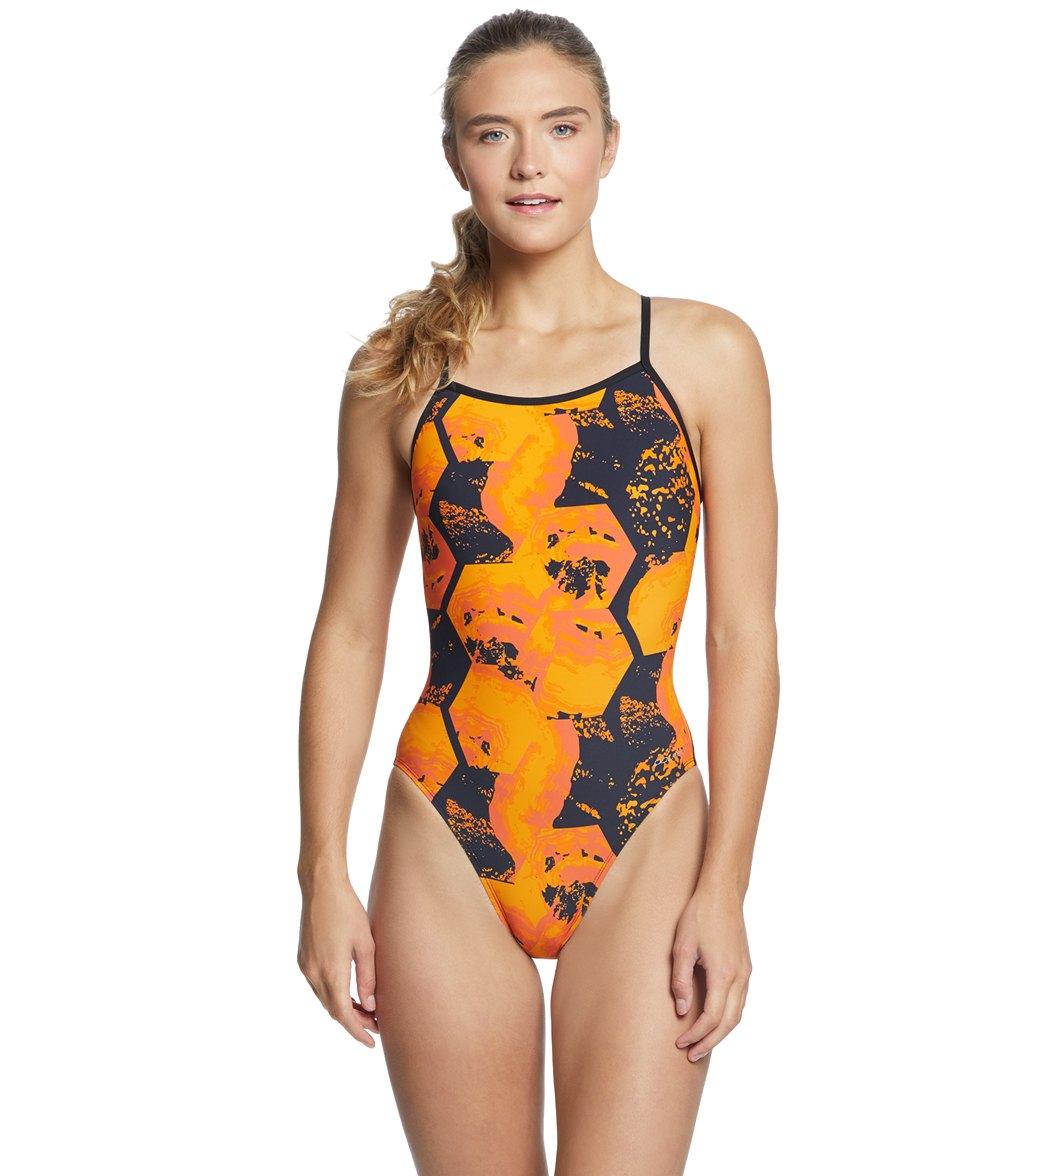 Dolfin Graphlite Women's Rogue V Back One Piece Swimsuit